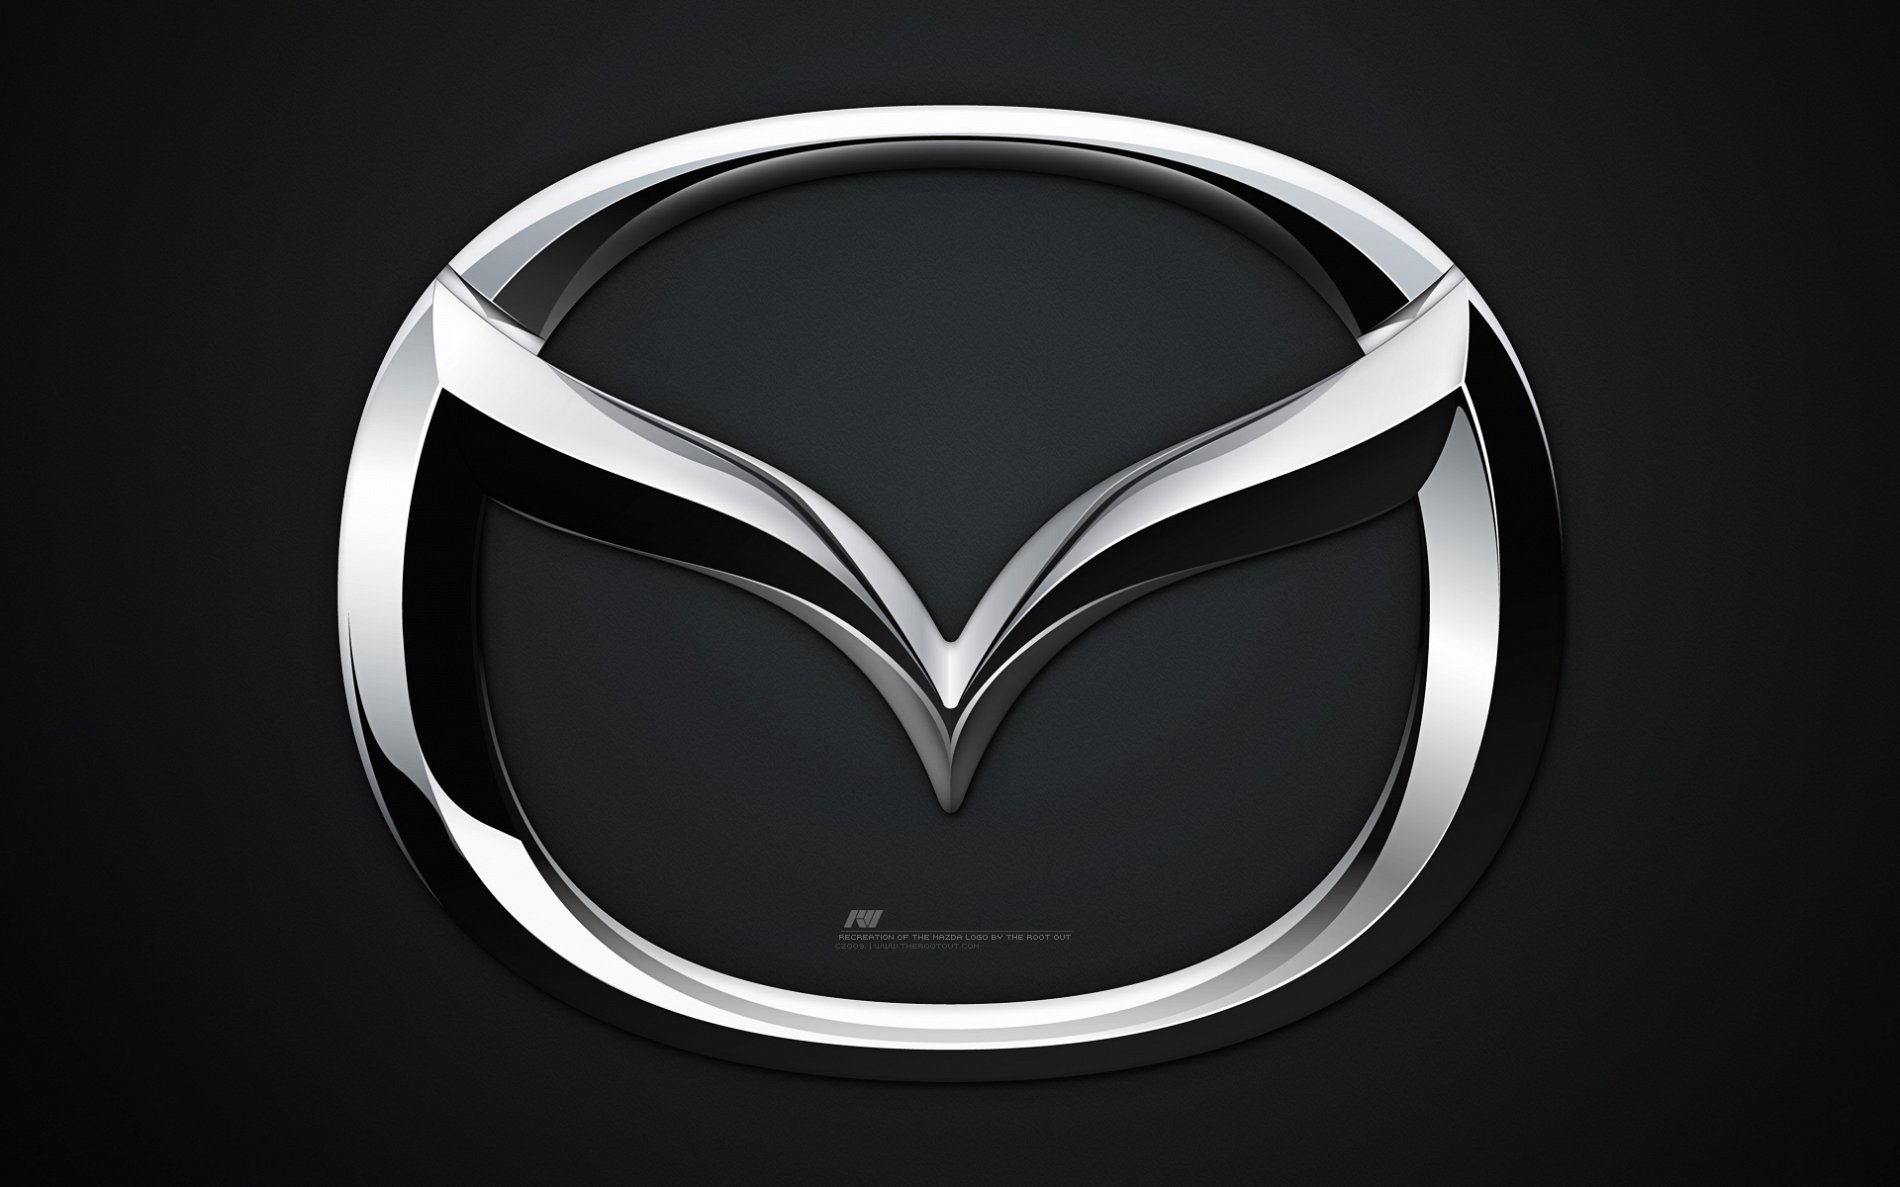 Grand Opening Of Mazda Show Room Lebtivity